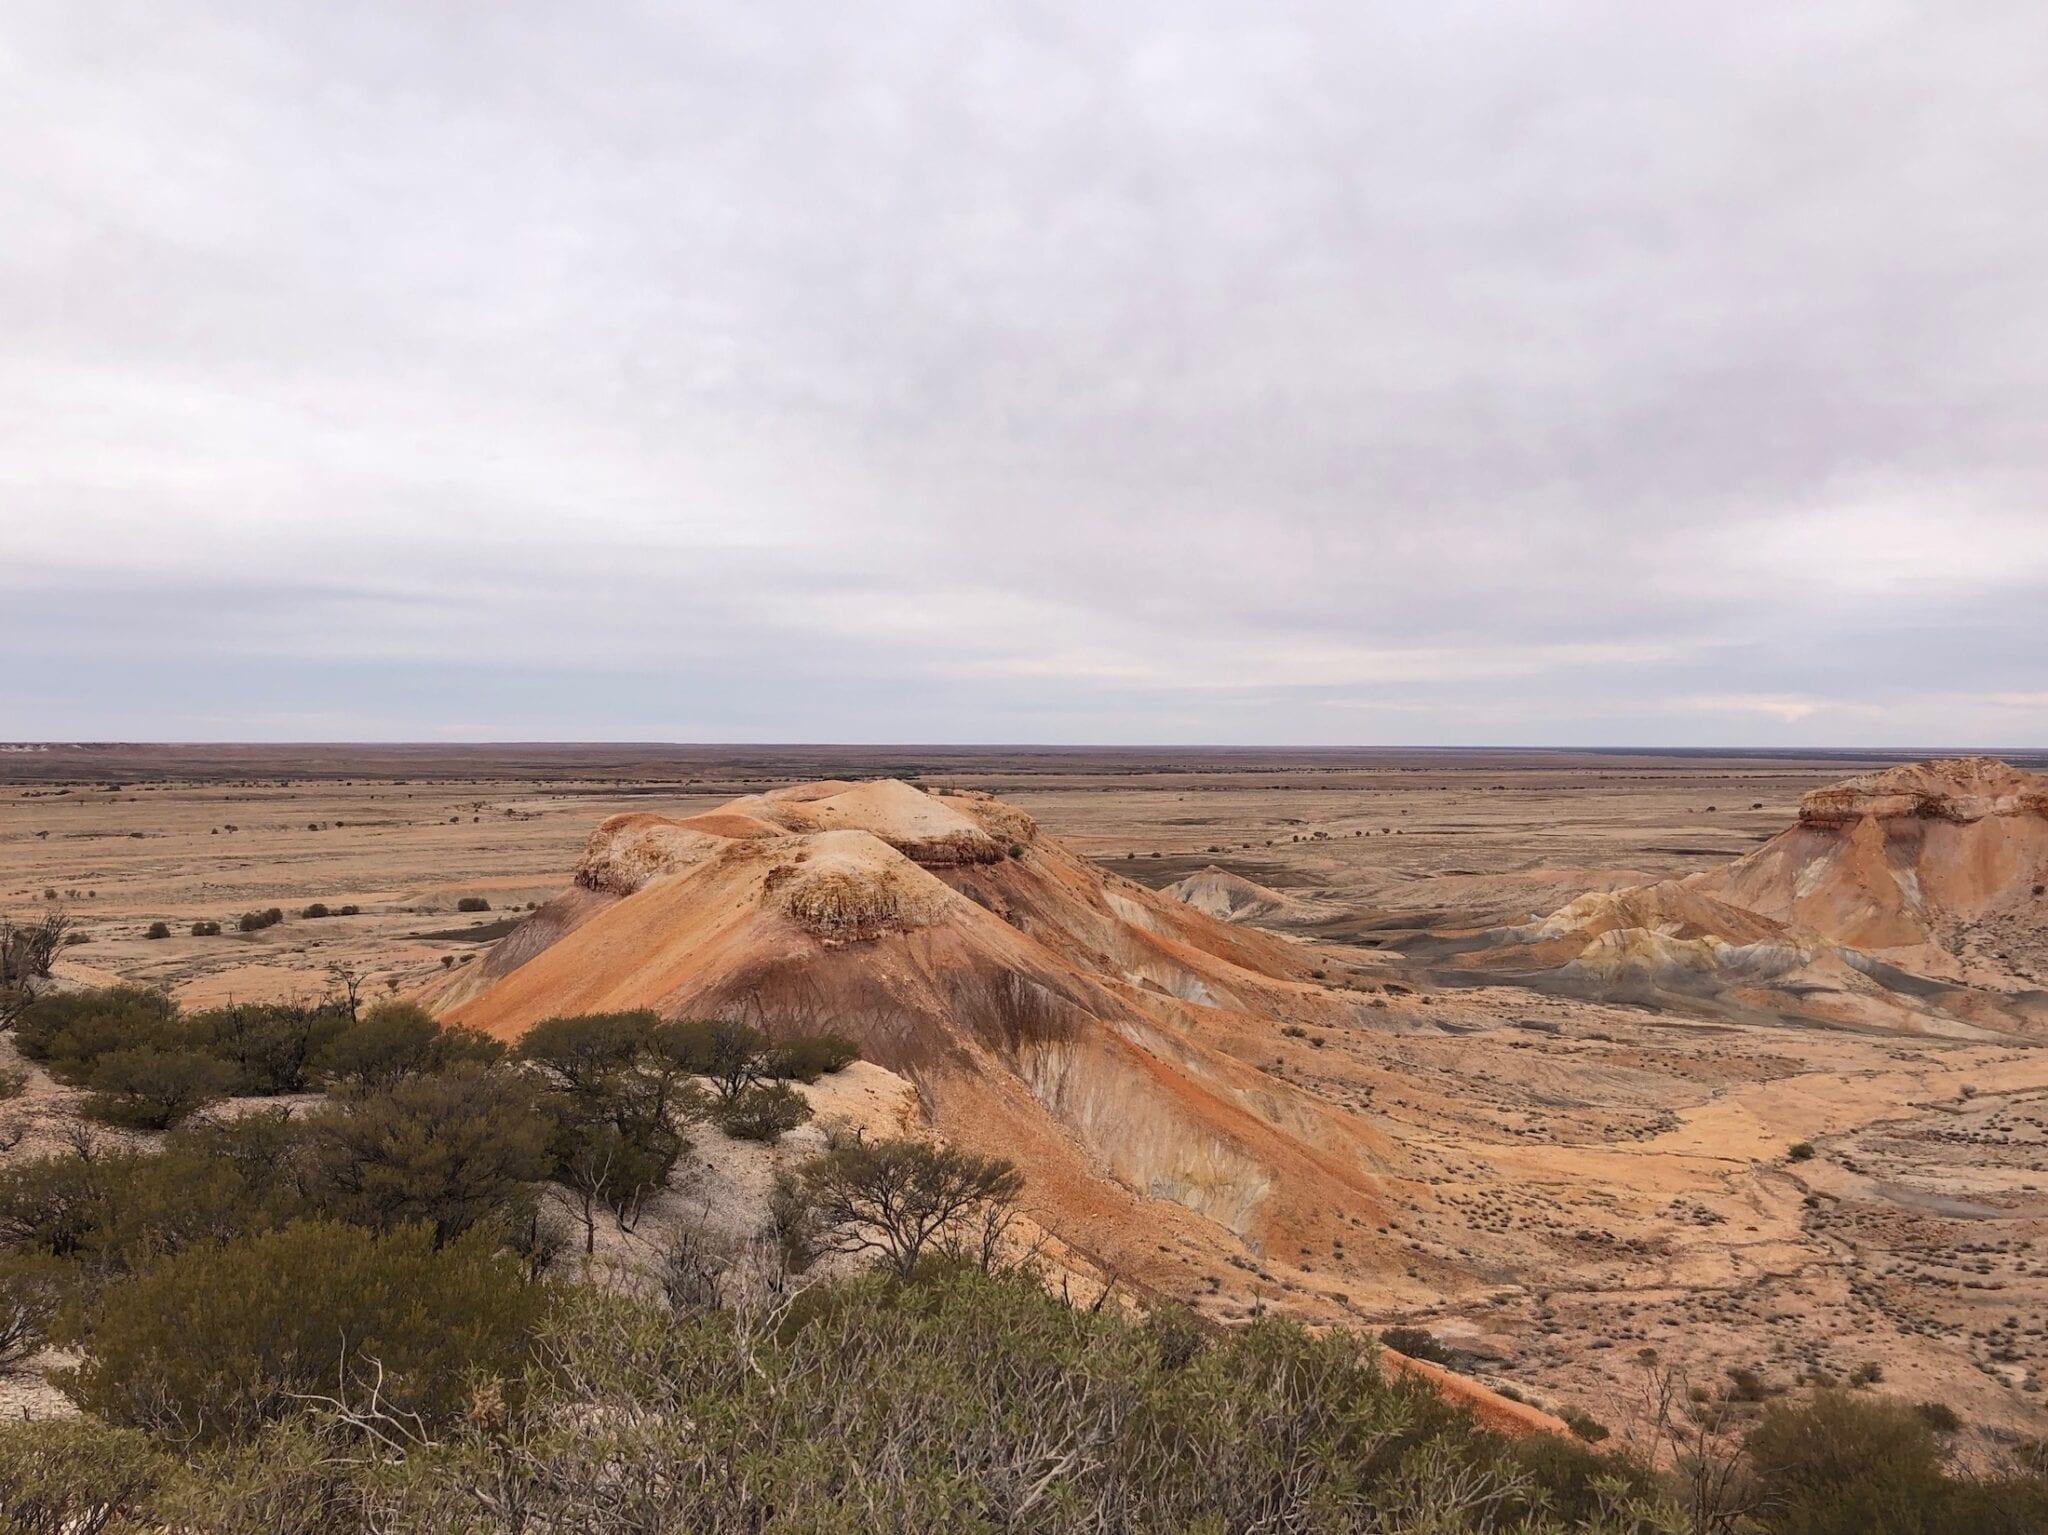 Looking down a ridge at the Painted Desert SA.